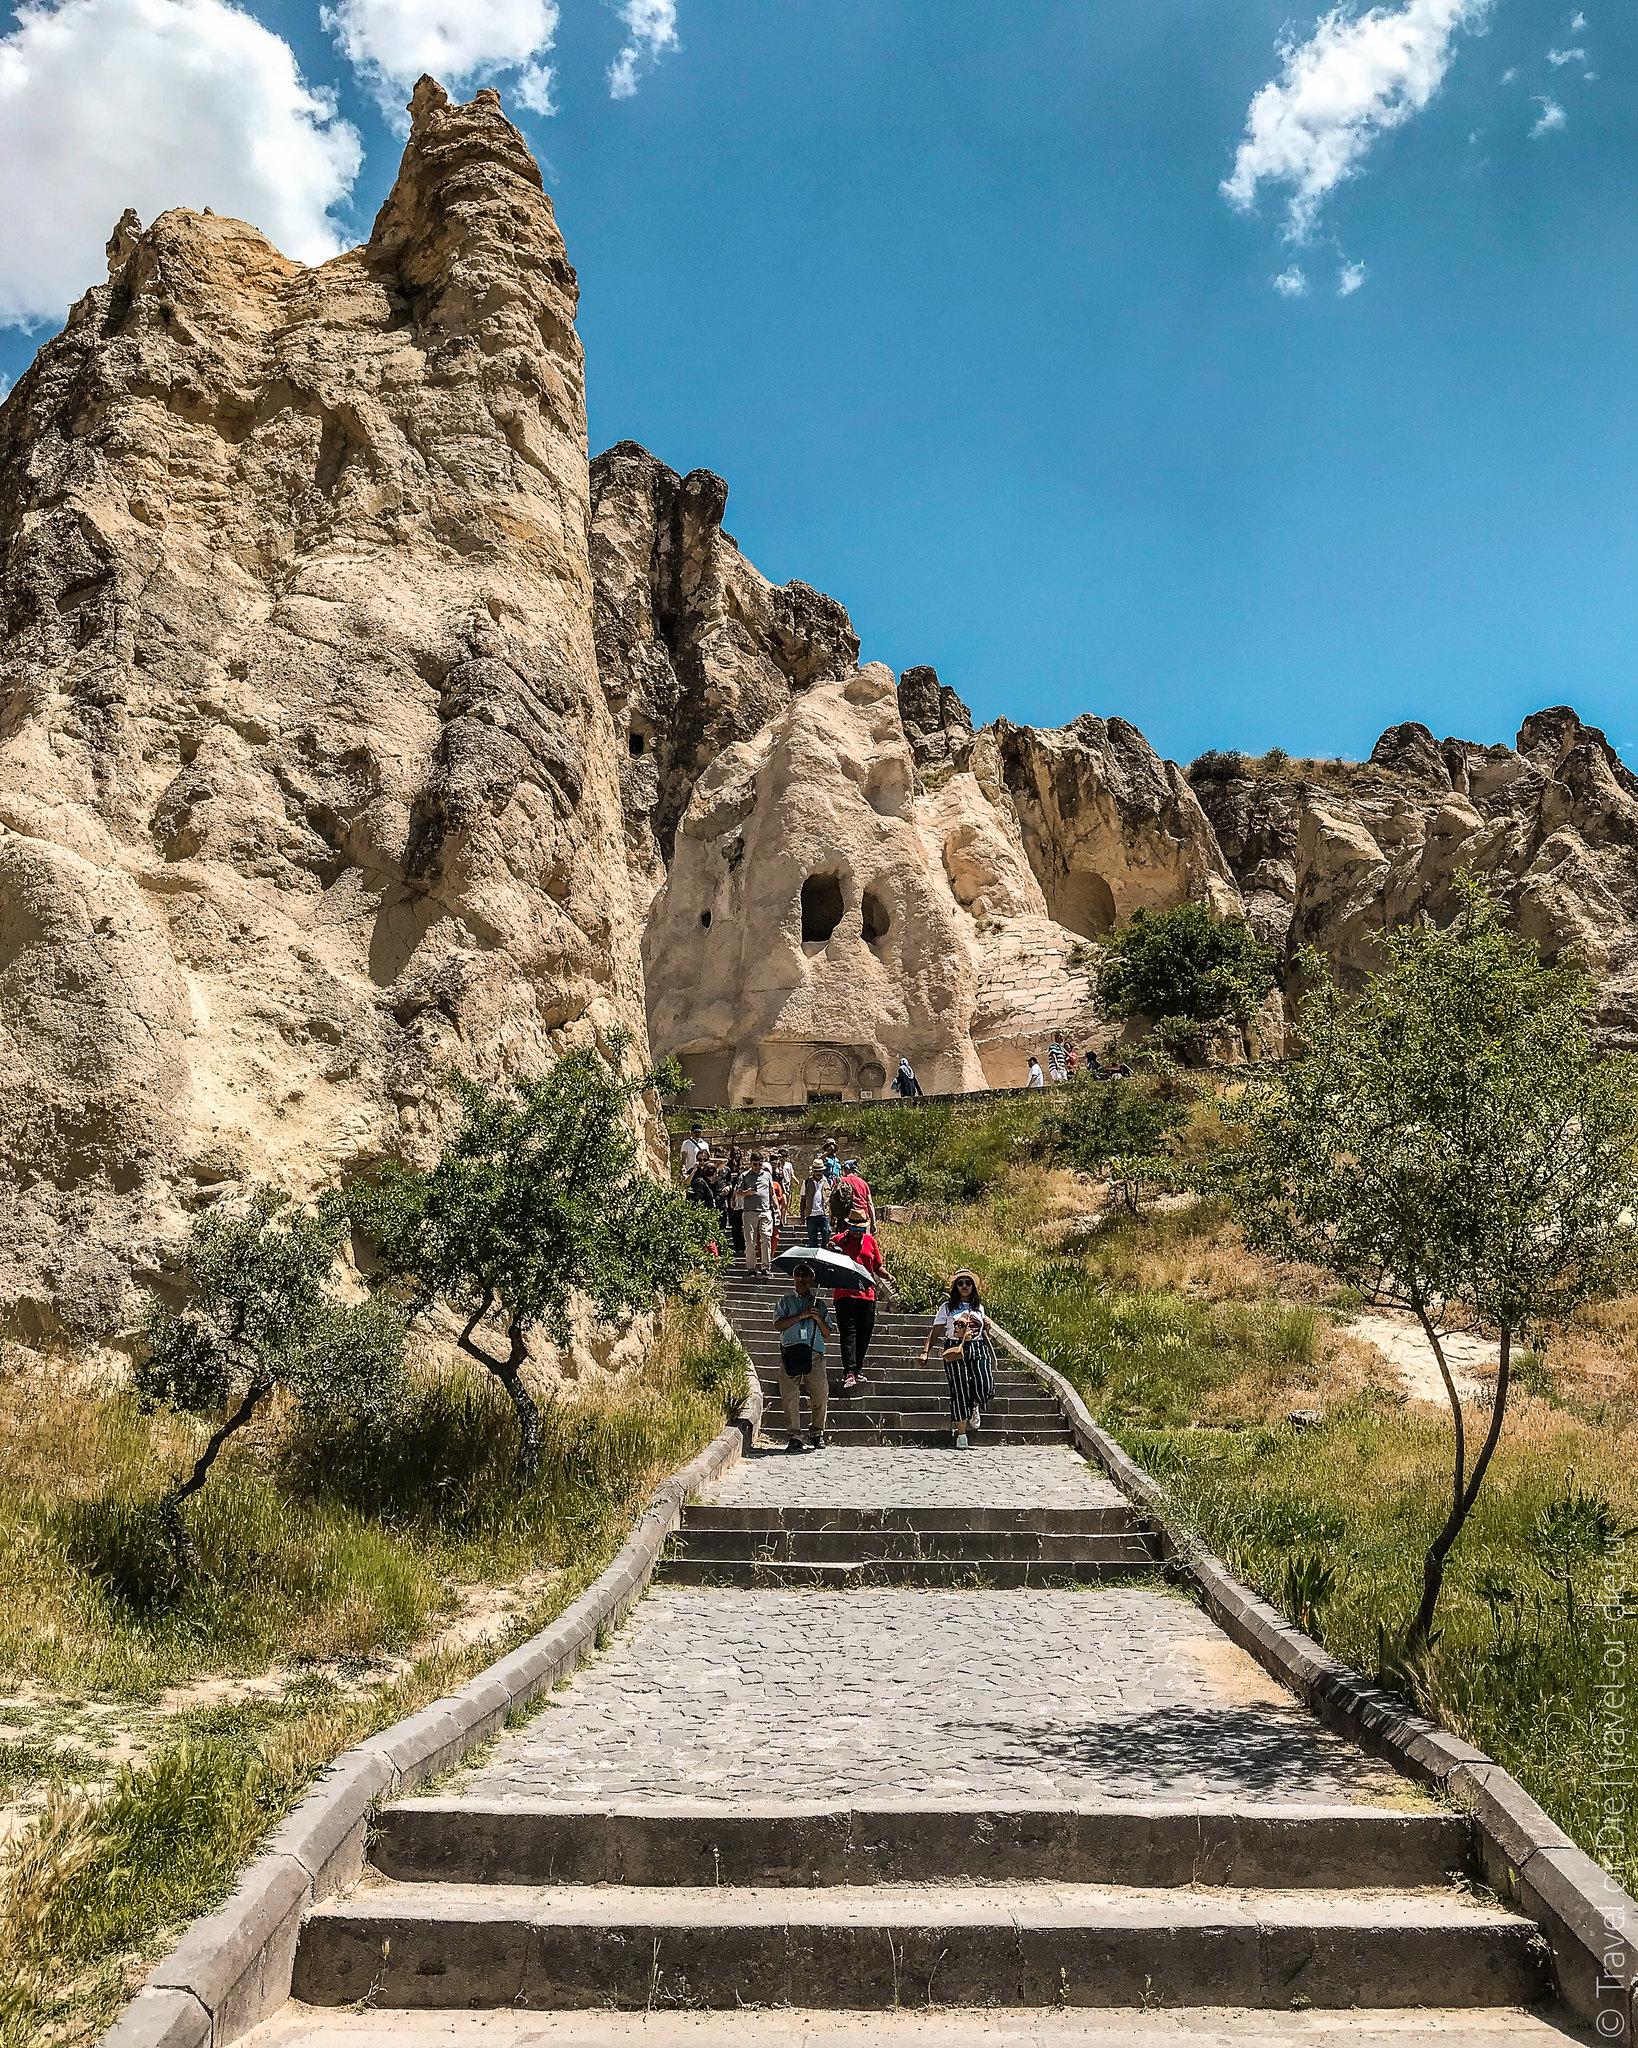 Goreme-National-Park-Cappadocia-8181